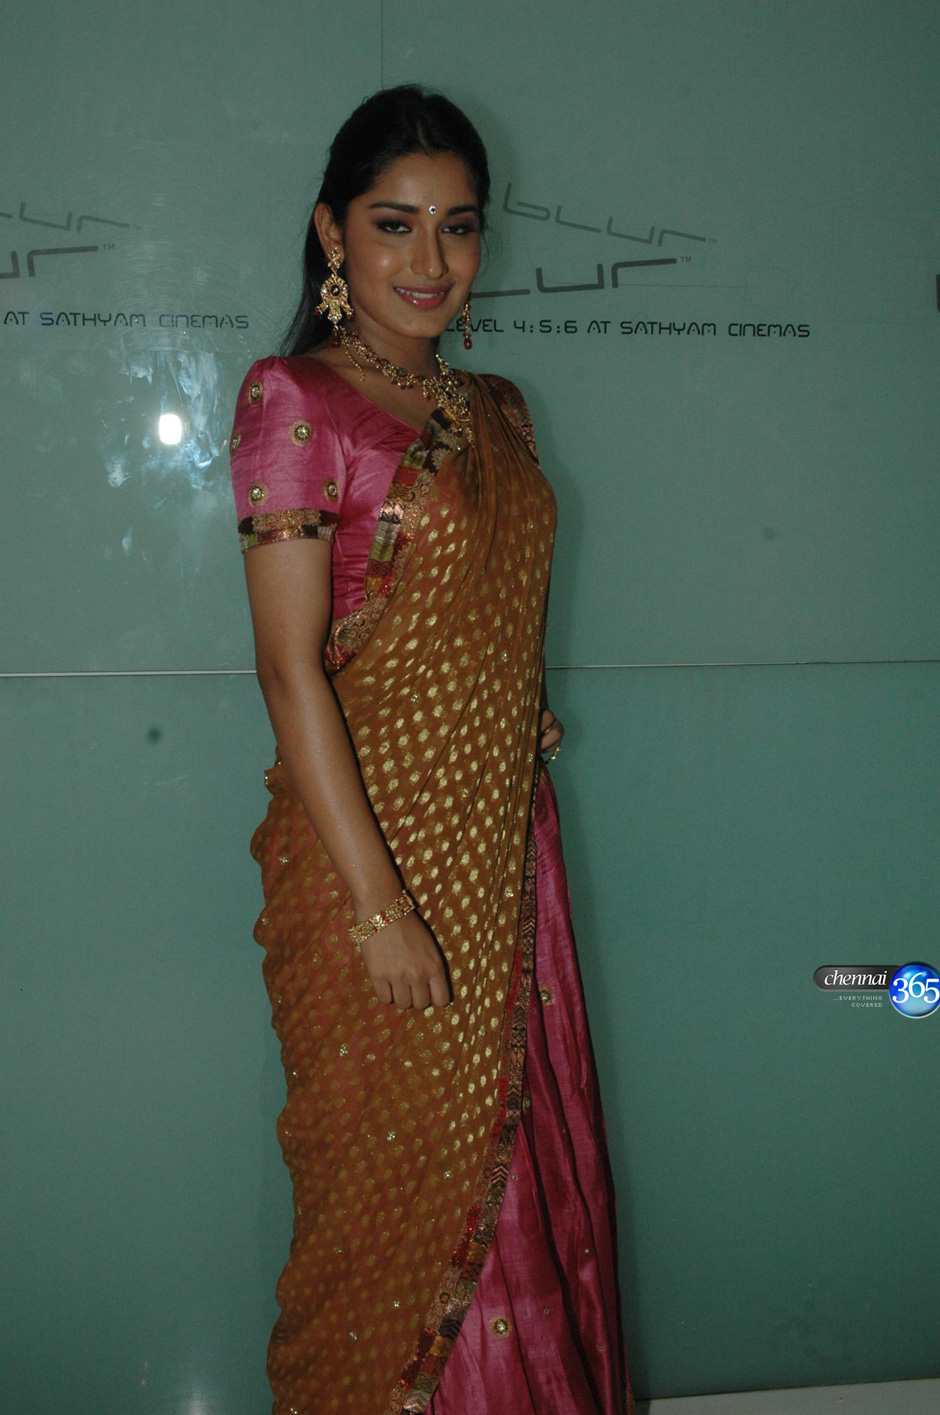 Wallpaper World Beautiful Indian Girl In Pink Saree-6020